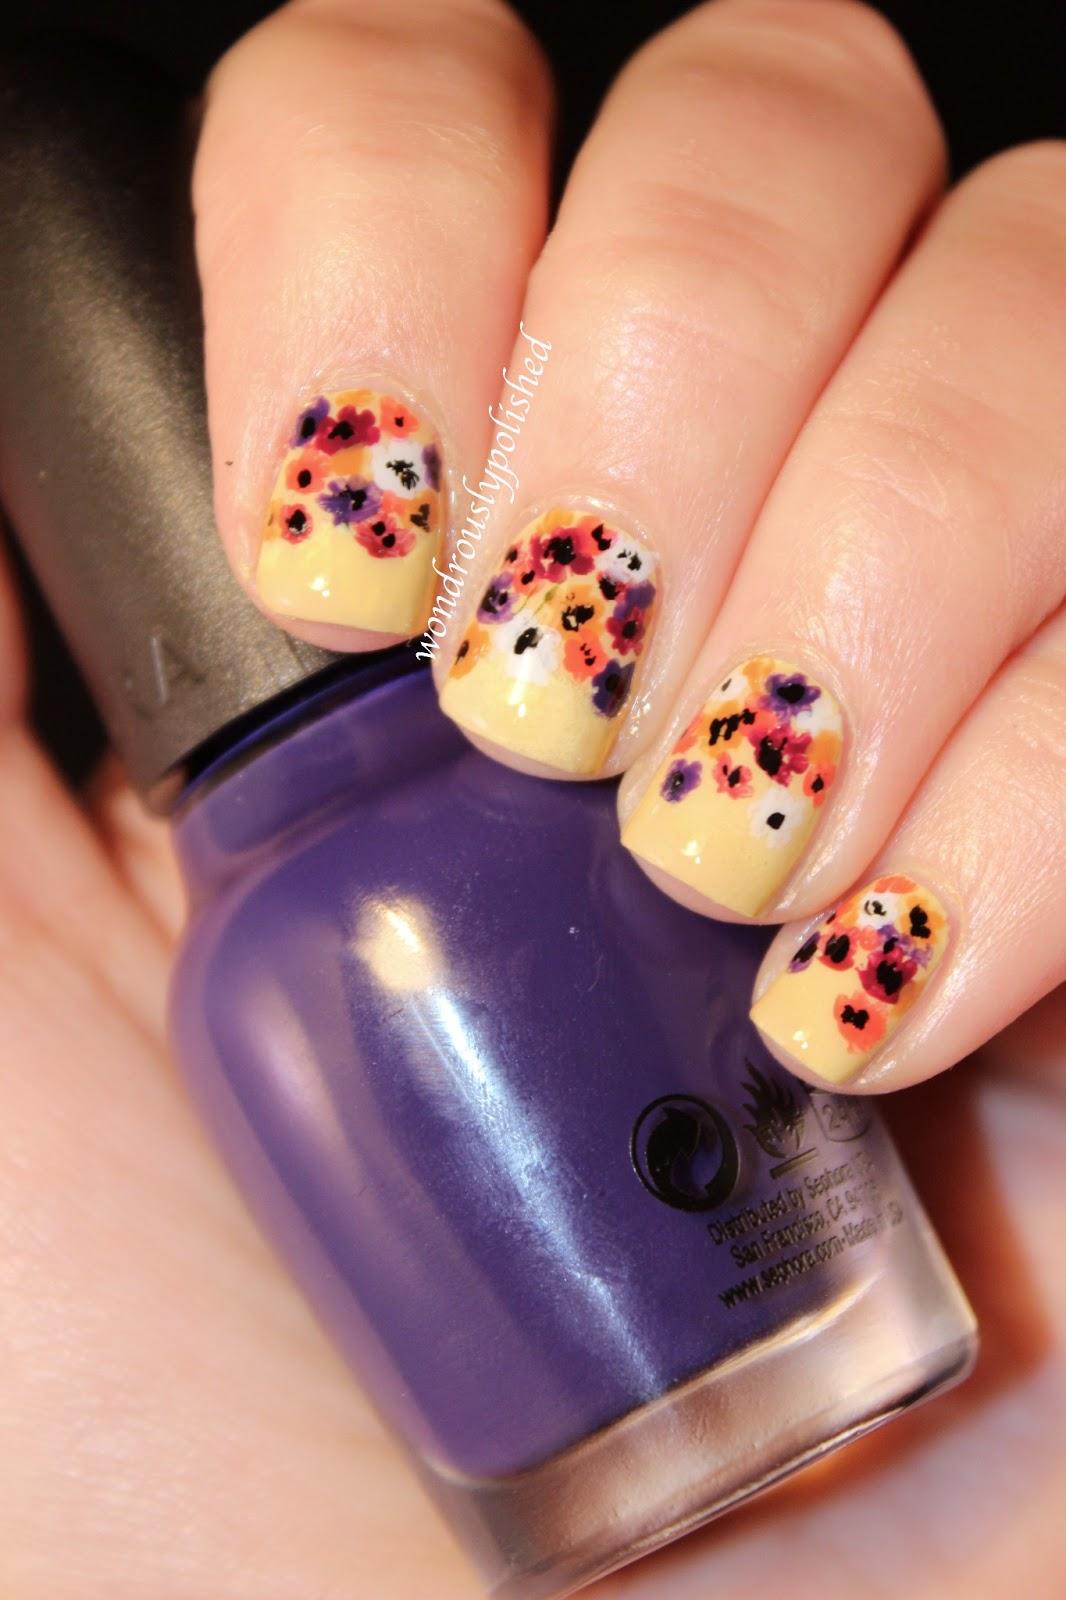 Wondrously Polished April Nail Art Challenge: Wondrously Polished: February Nail Art Challenge